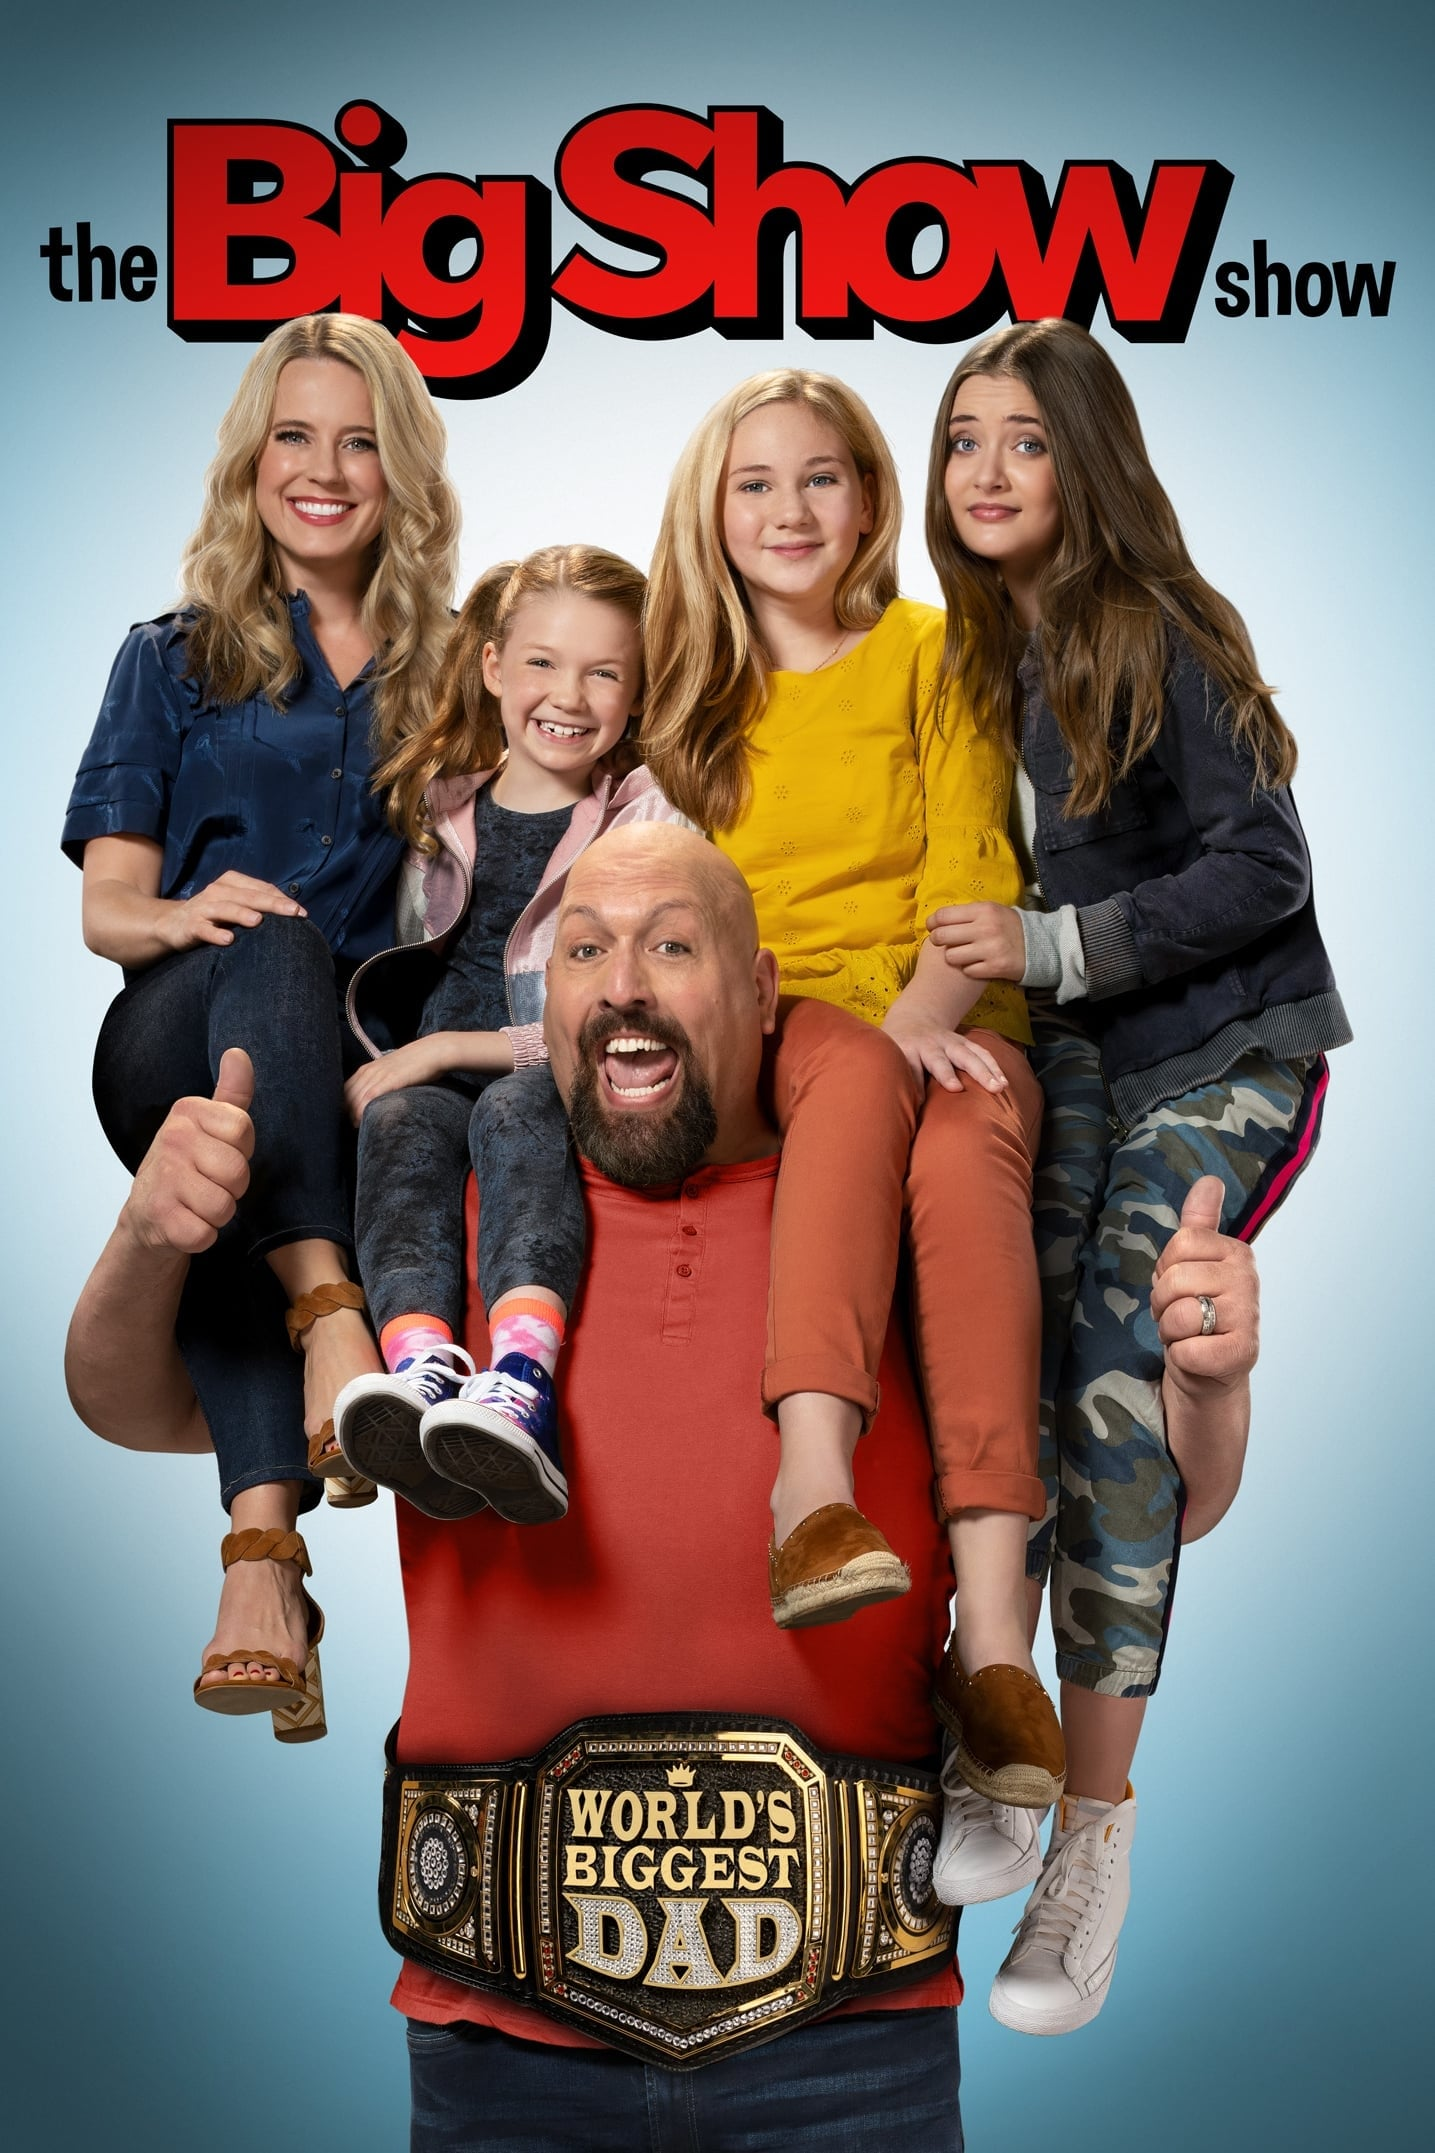 The Big Show Show Season 1